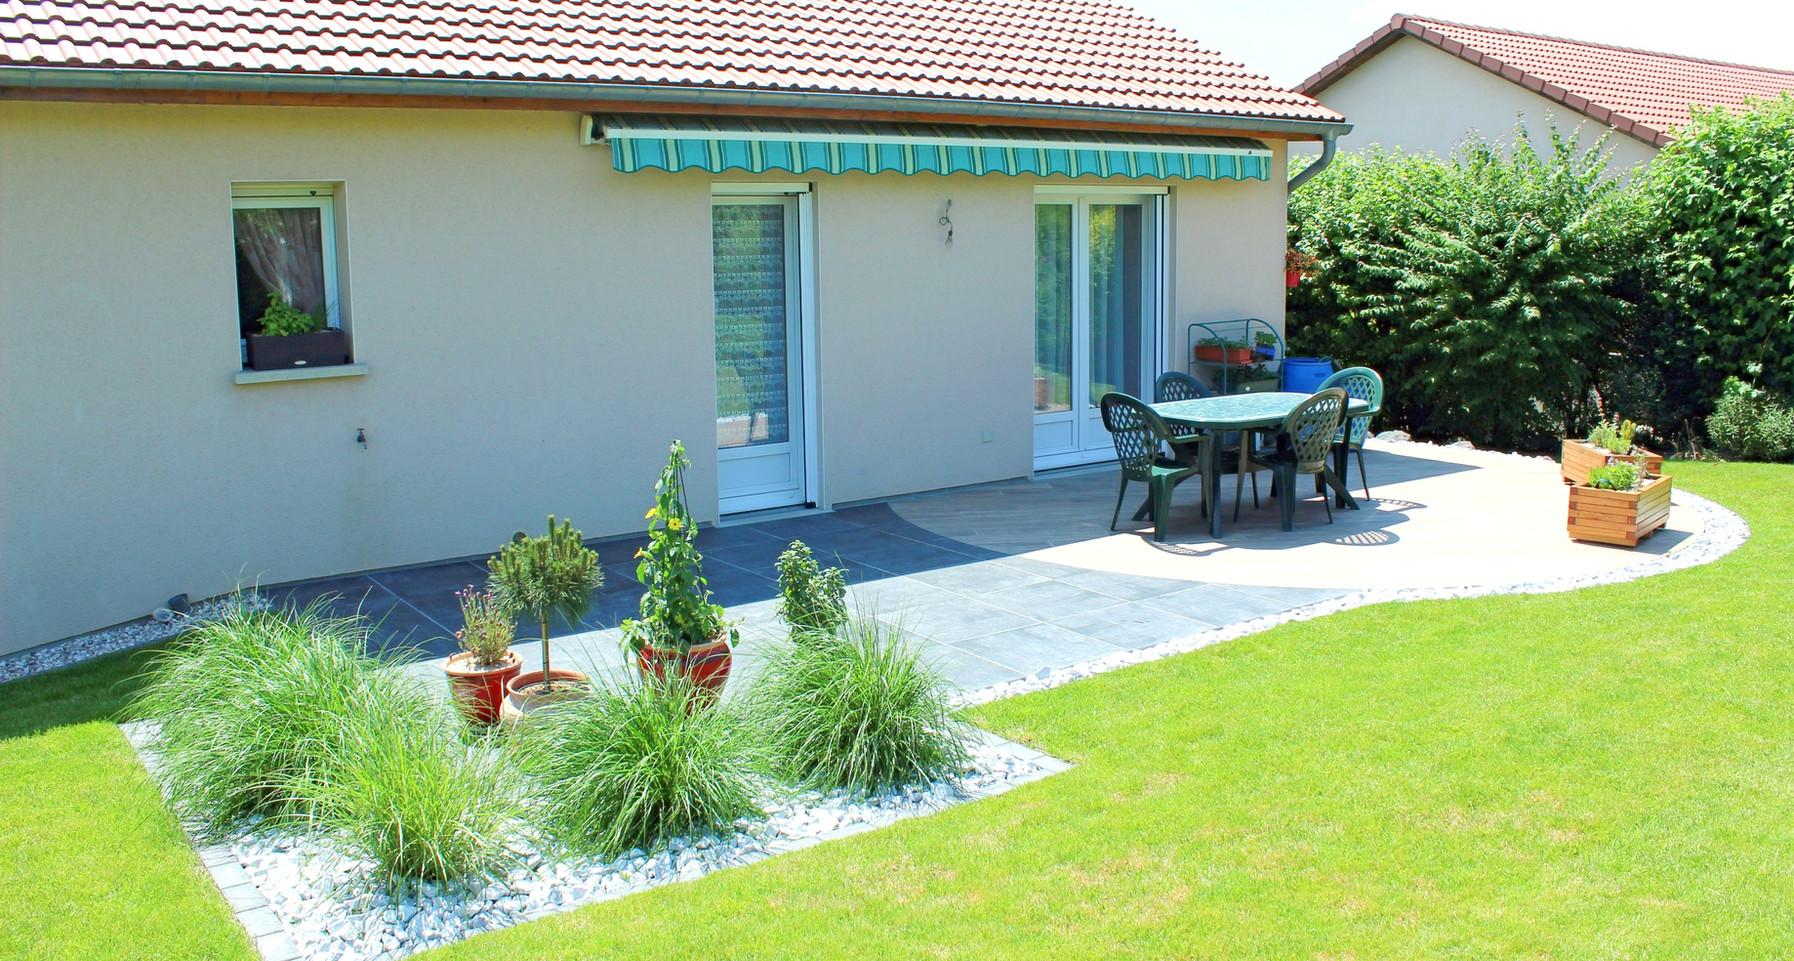 terrasse-spa-maison-qualite-paysage-8_ed